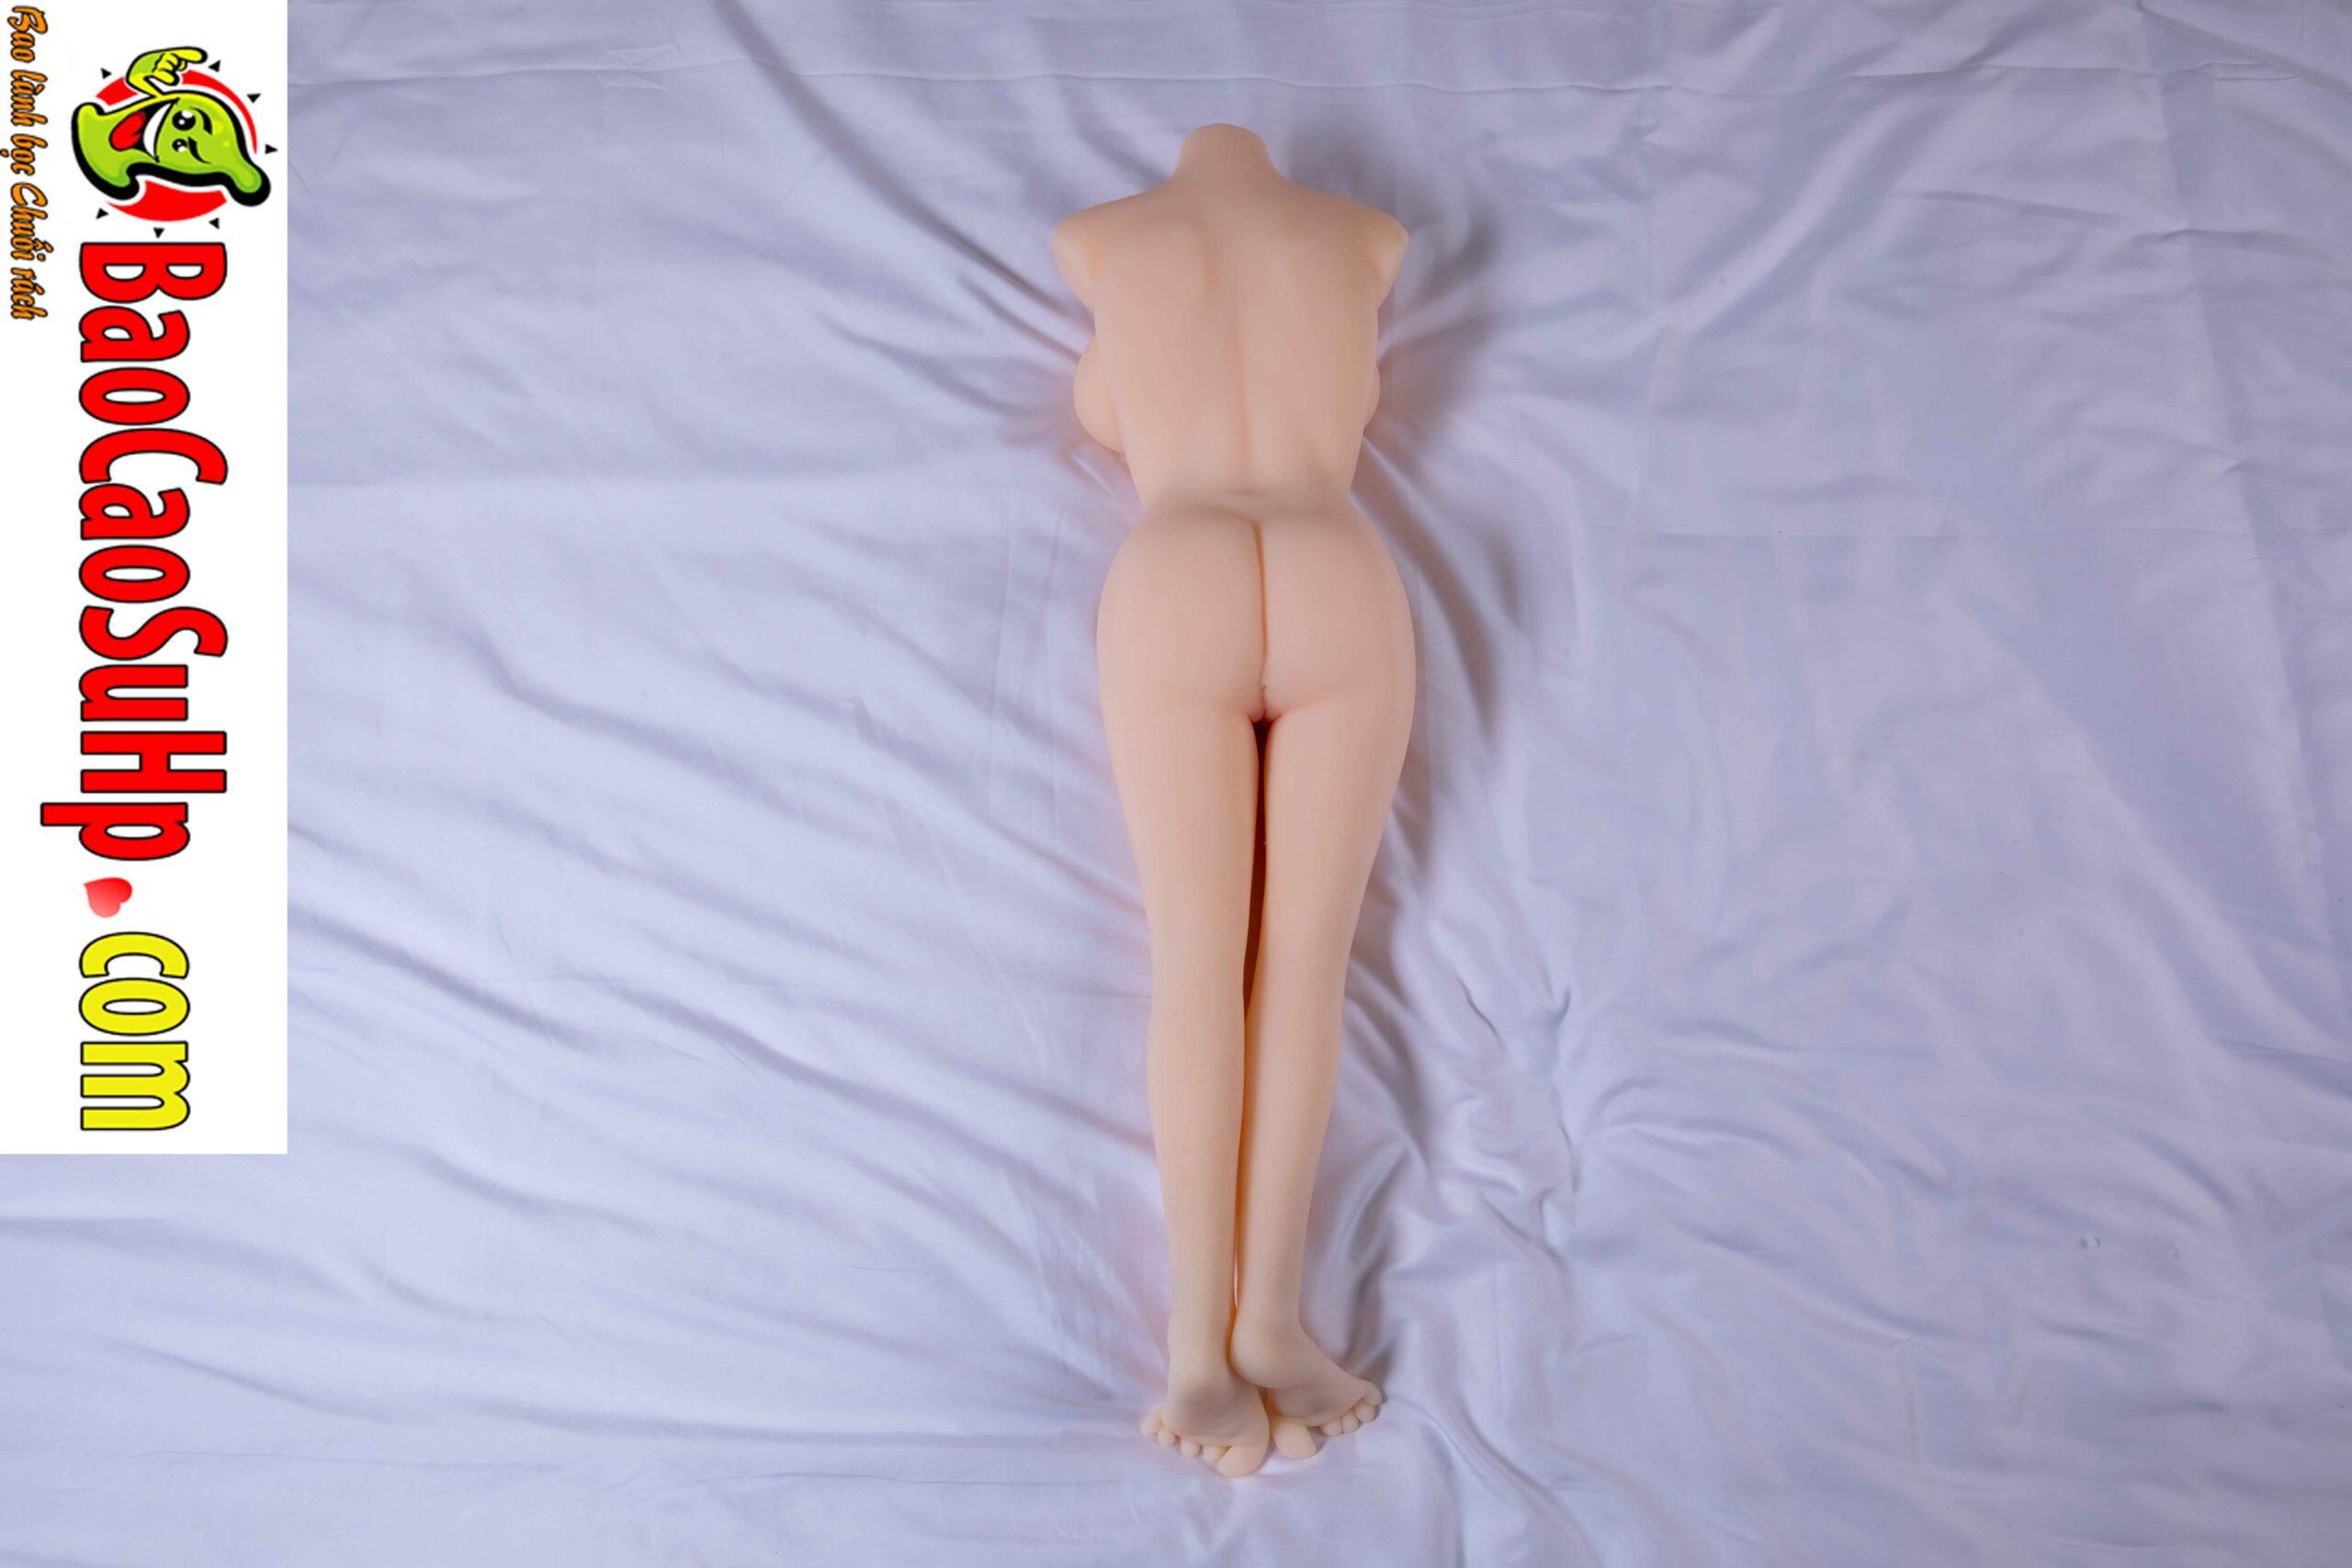 bup be tinh duc Hime Ishihara Kannai 5 scaled - Búp bê bán thân chân dài Hime Ishihara Kannai Nhật Bản